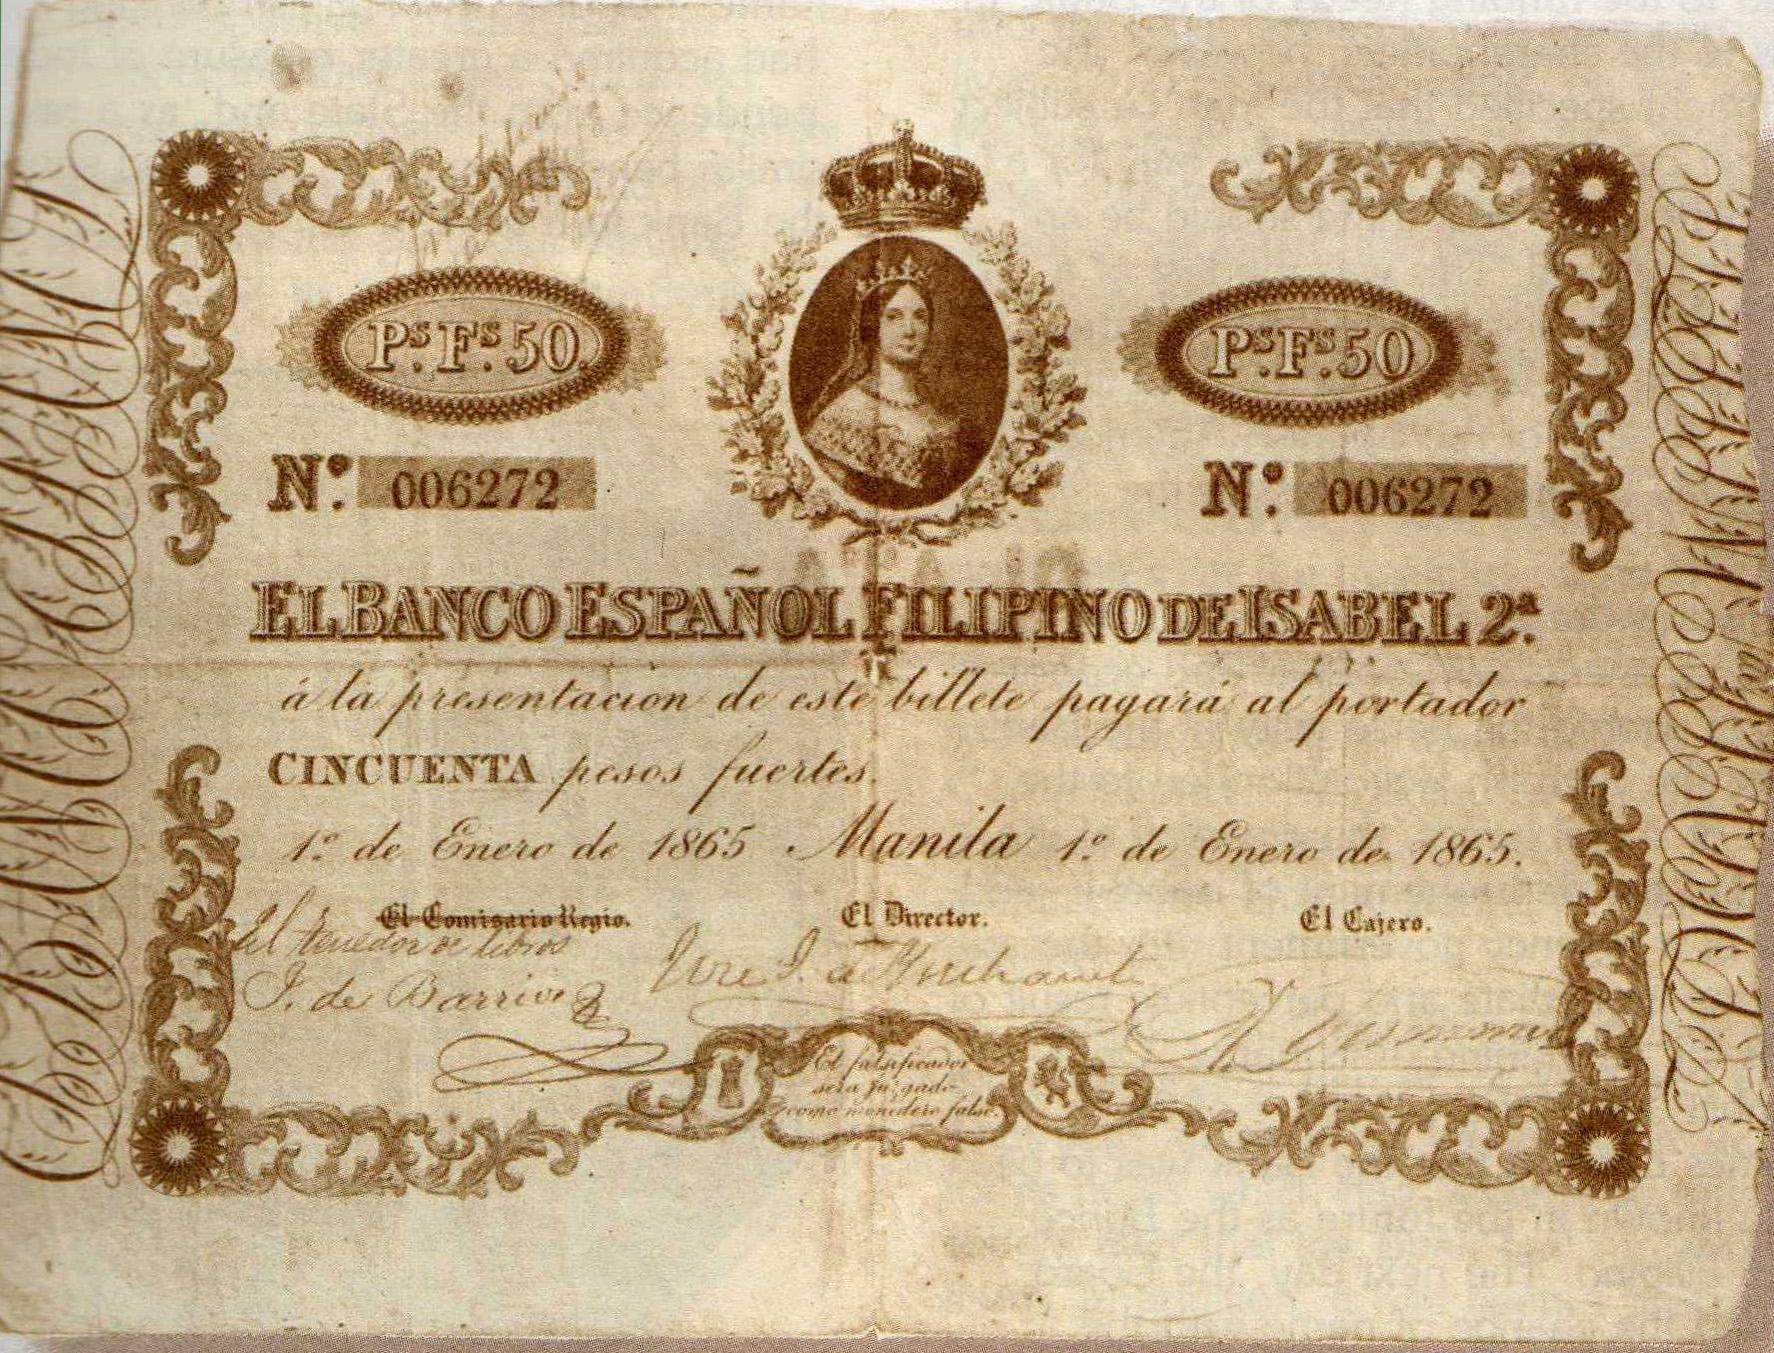 50 Pesos fuertes de Filipinas de Isabel II PHL_-_50_pesos_fuertes_anverso